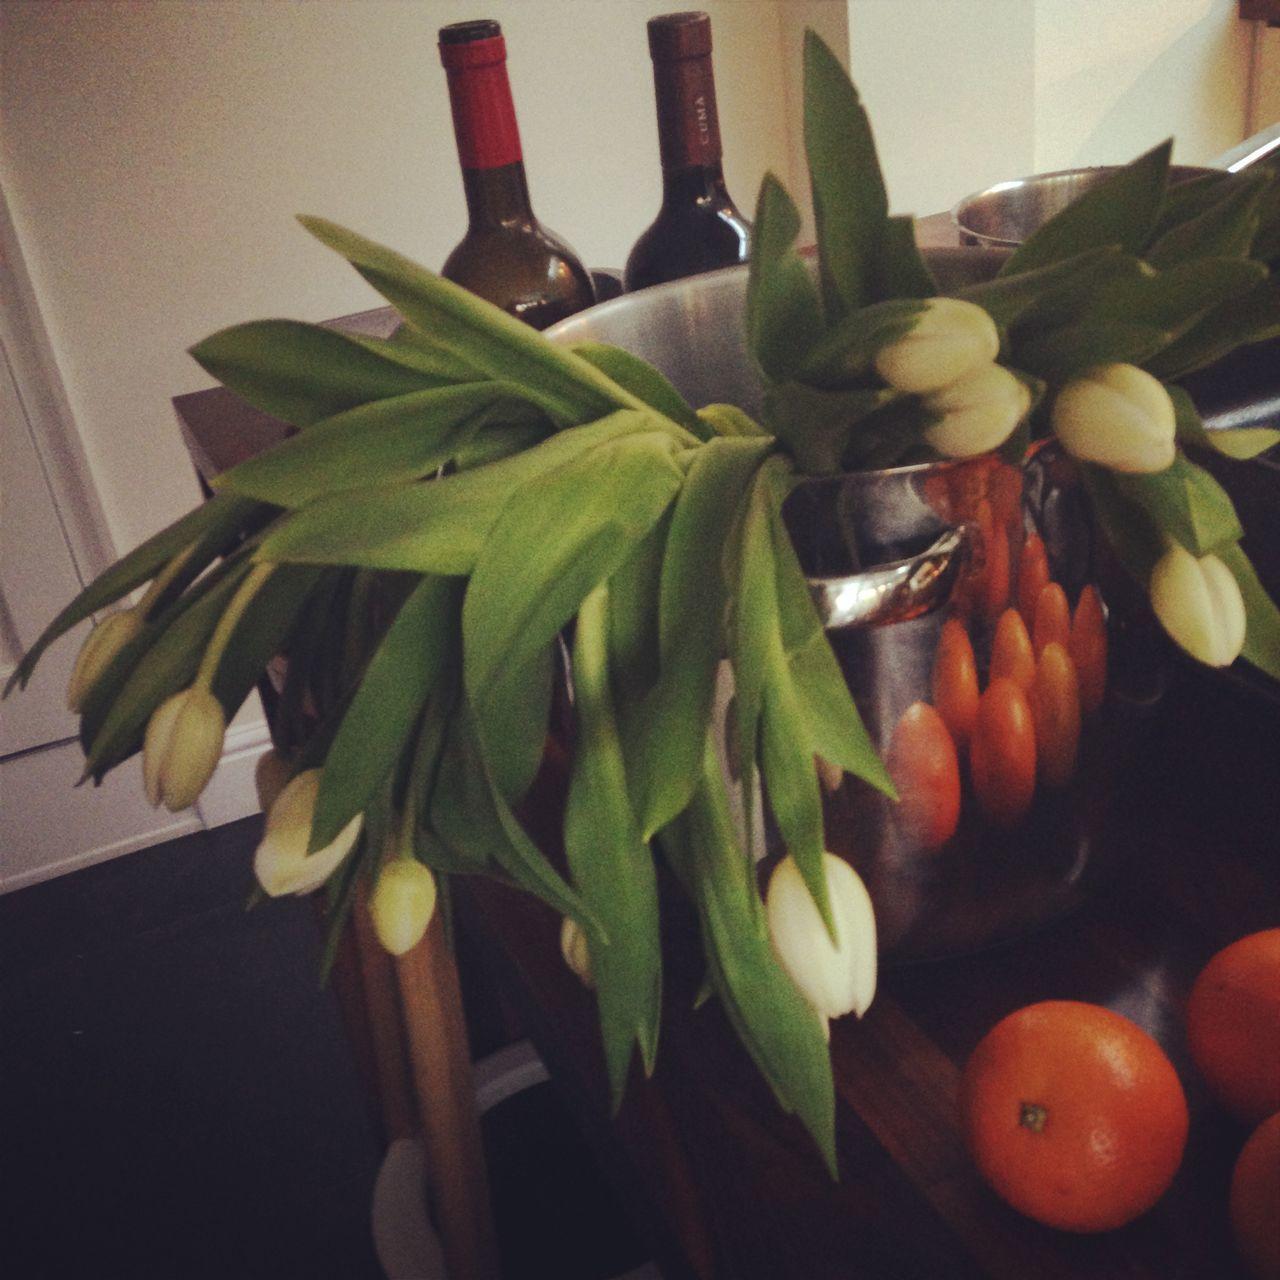 leaf, food and drink, indoors, bottle, freshness, no people, healthy eating, food, green color, close-up, fruit, flower, day